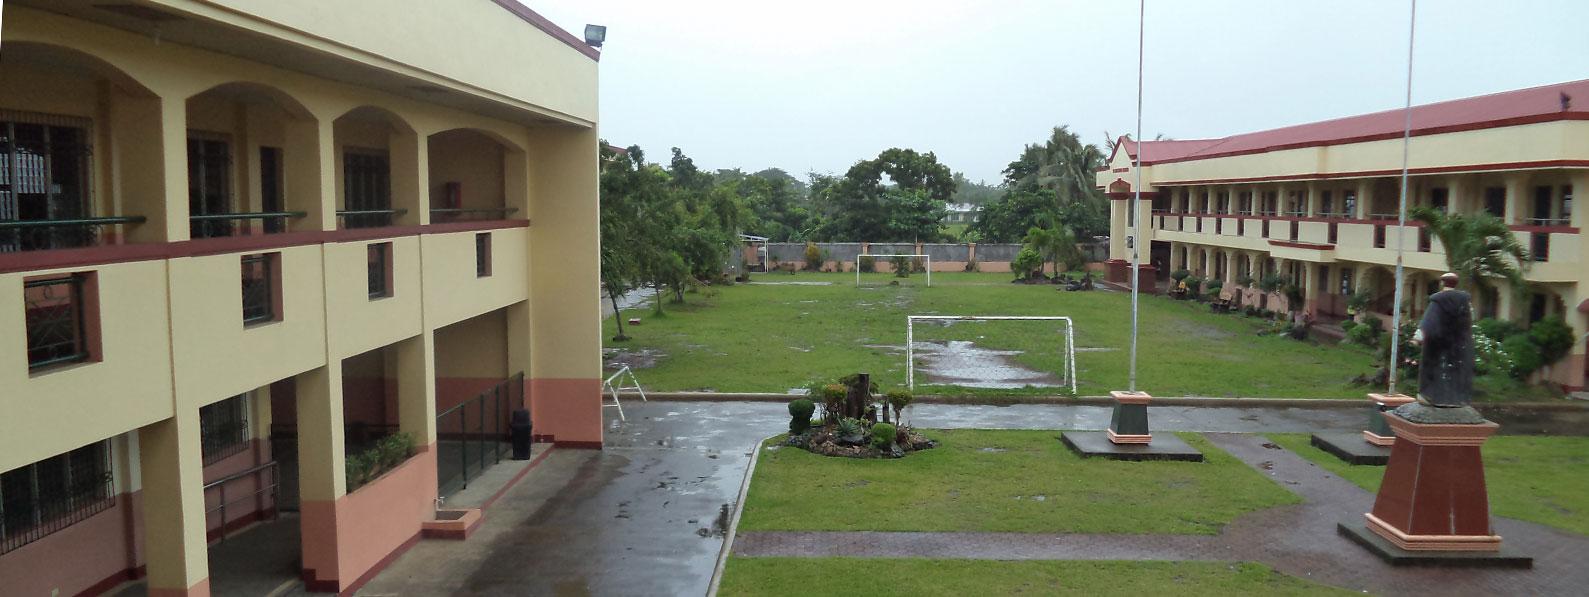 Scuola Calabanga